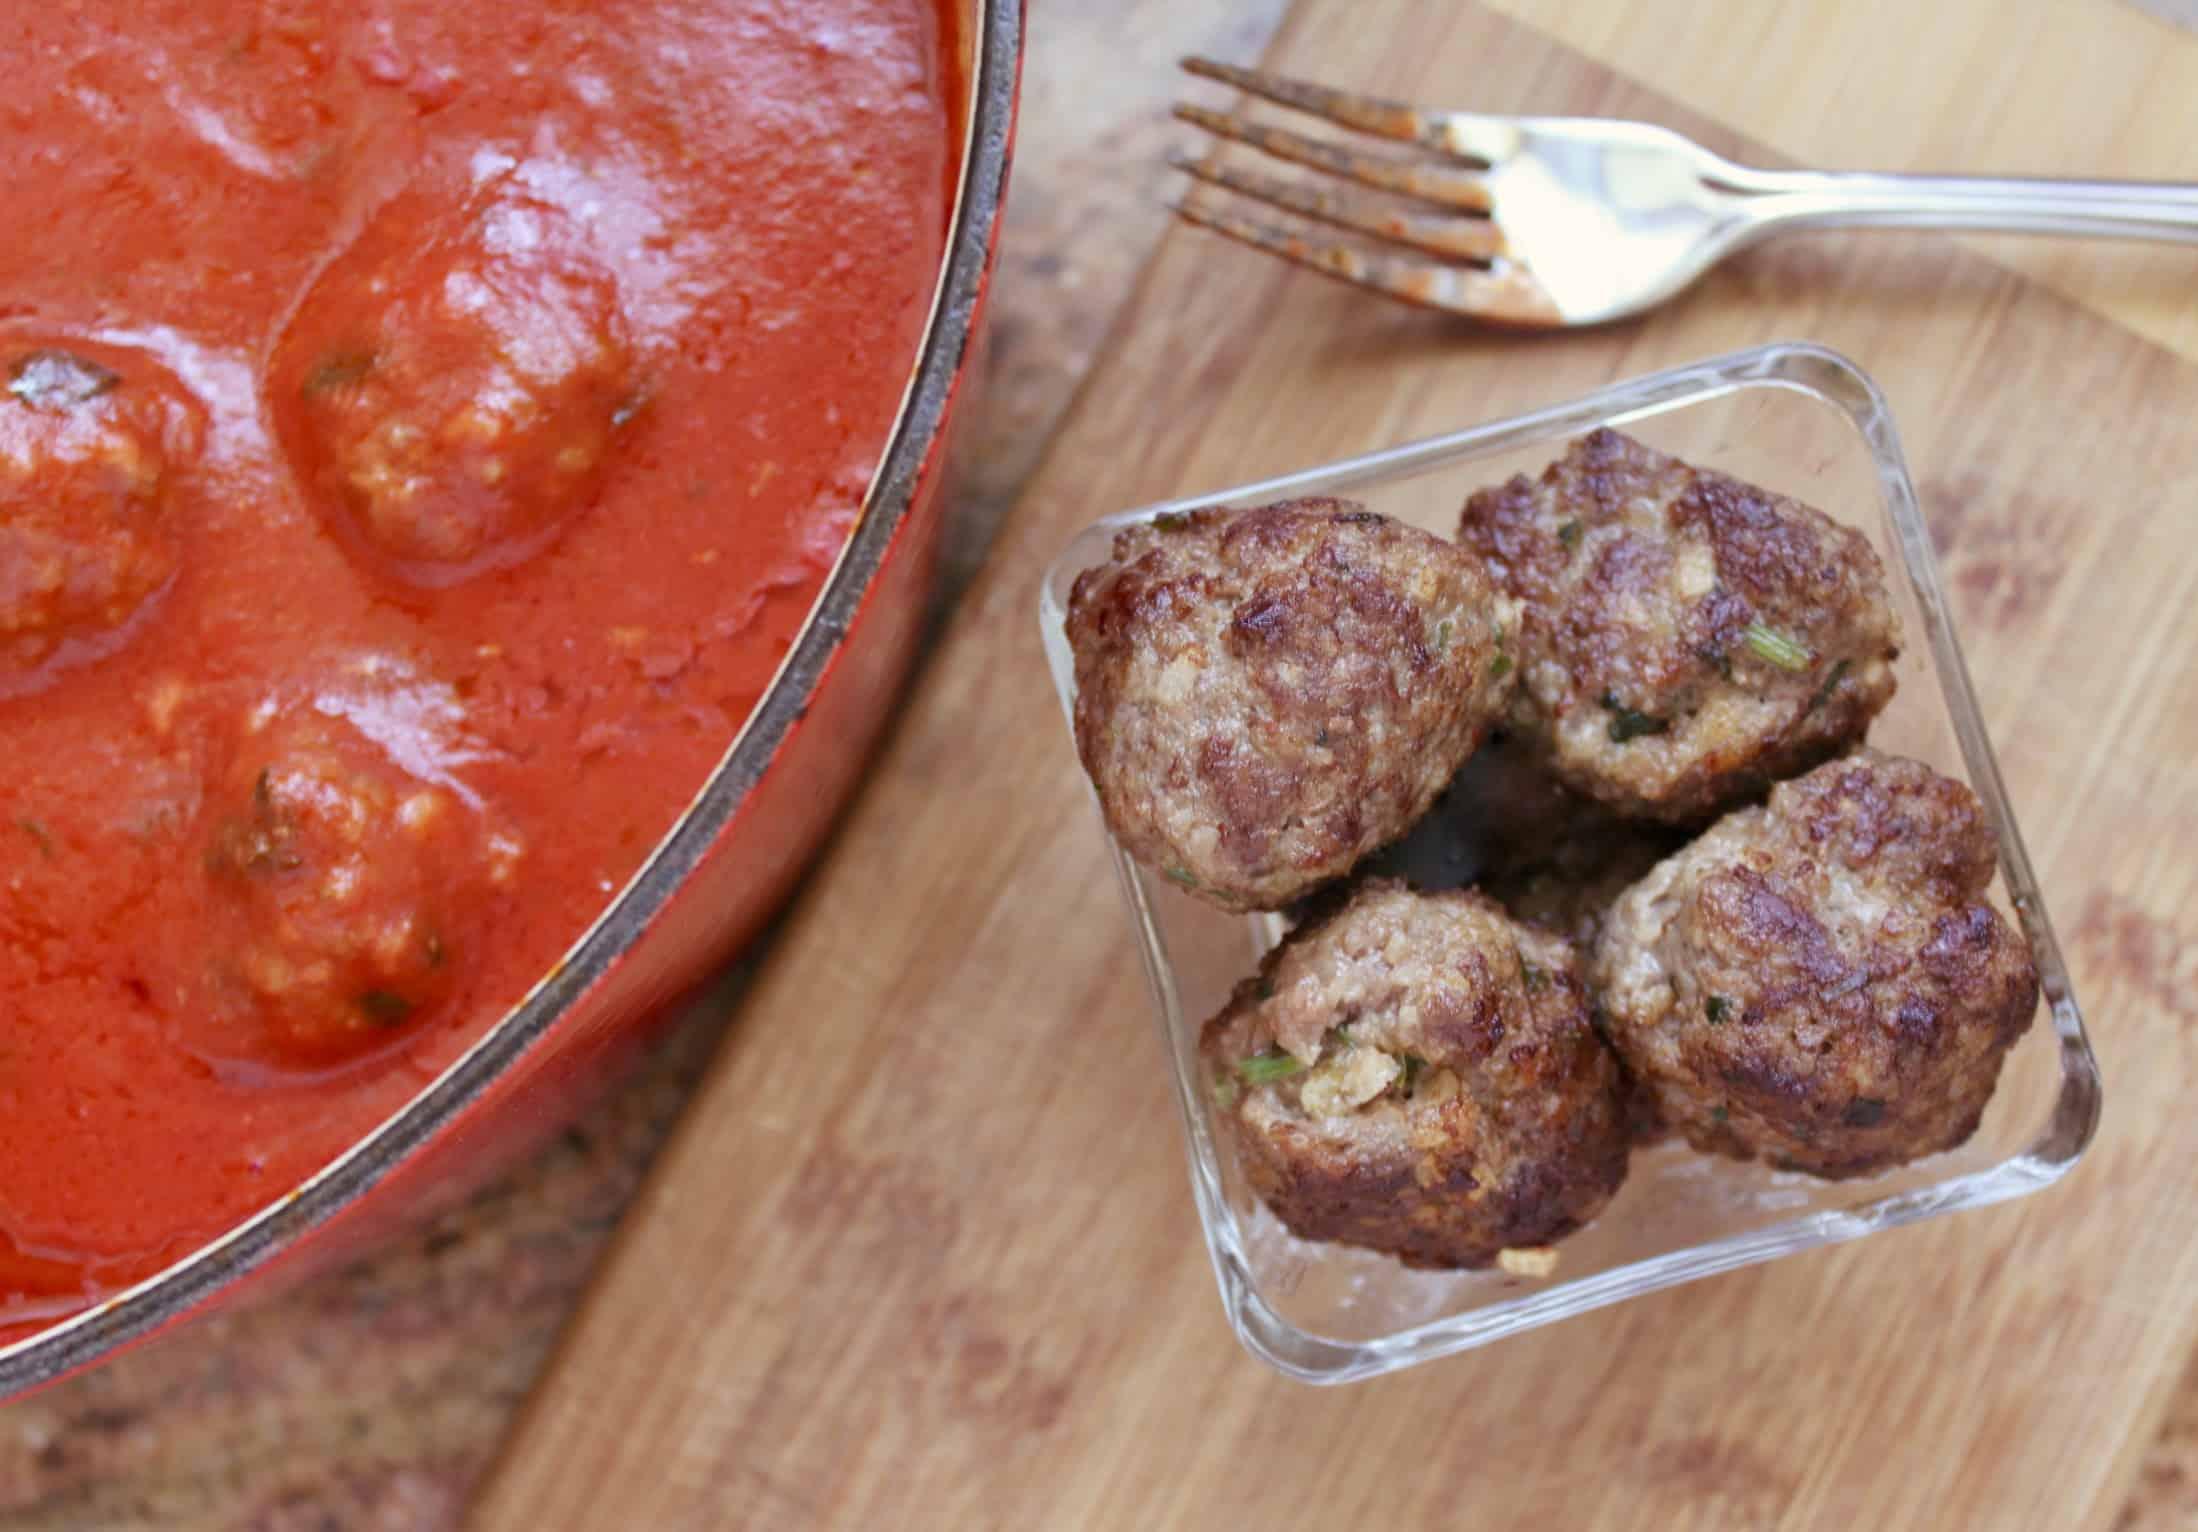 meatballs and sauce flatlay